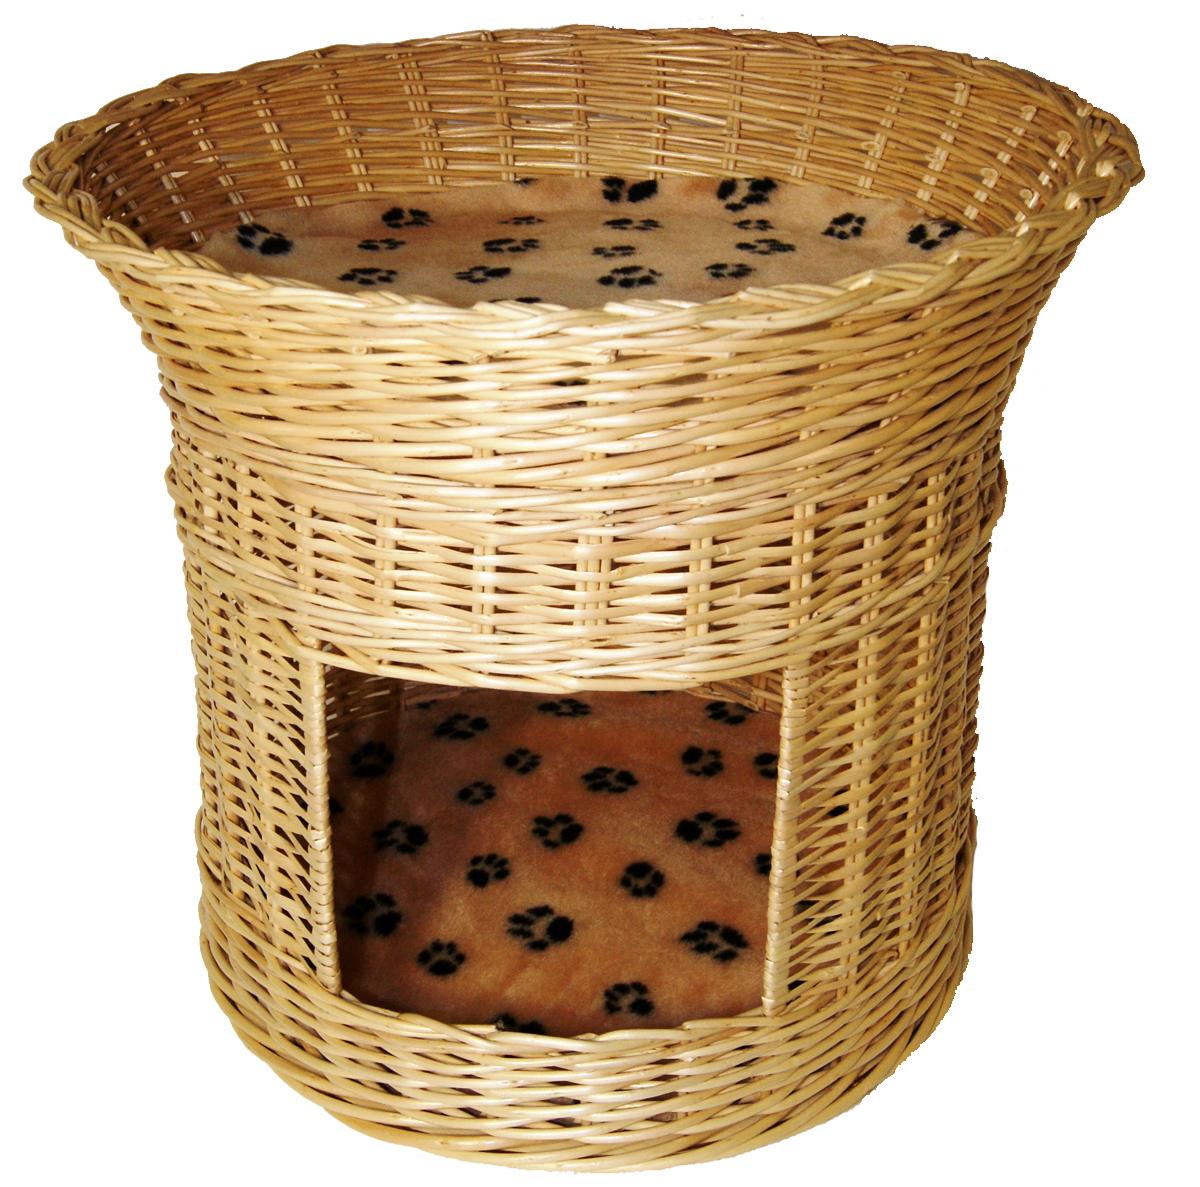 Домик для кошек Меридиан, 2-ярусный, цвет: лапки, 54 х 54 х 47 см домик когтеточка меридиан угловой 4 ярусный цвет тигровый 55 х 48 х 158 см